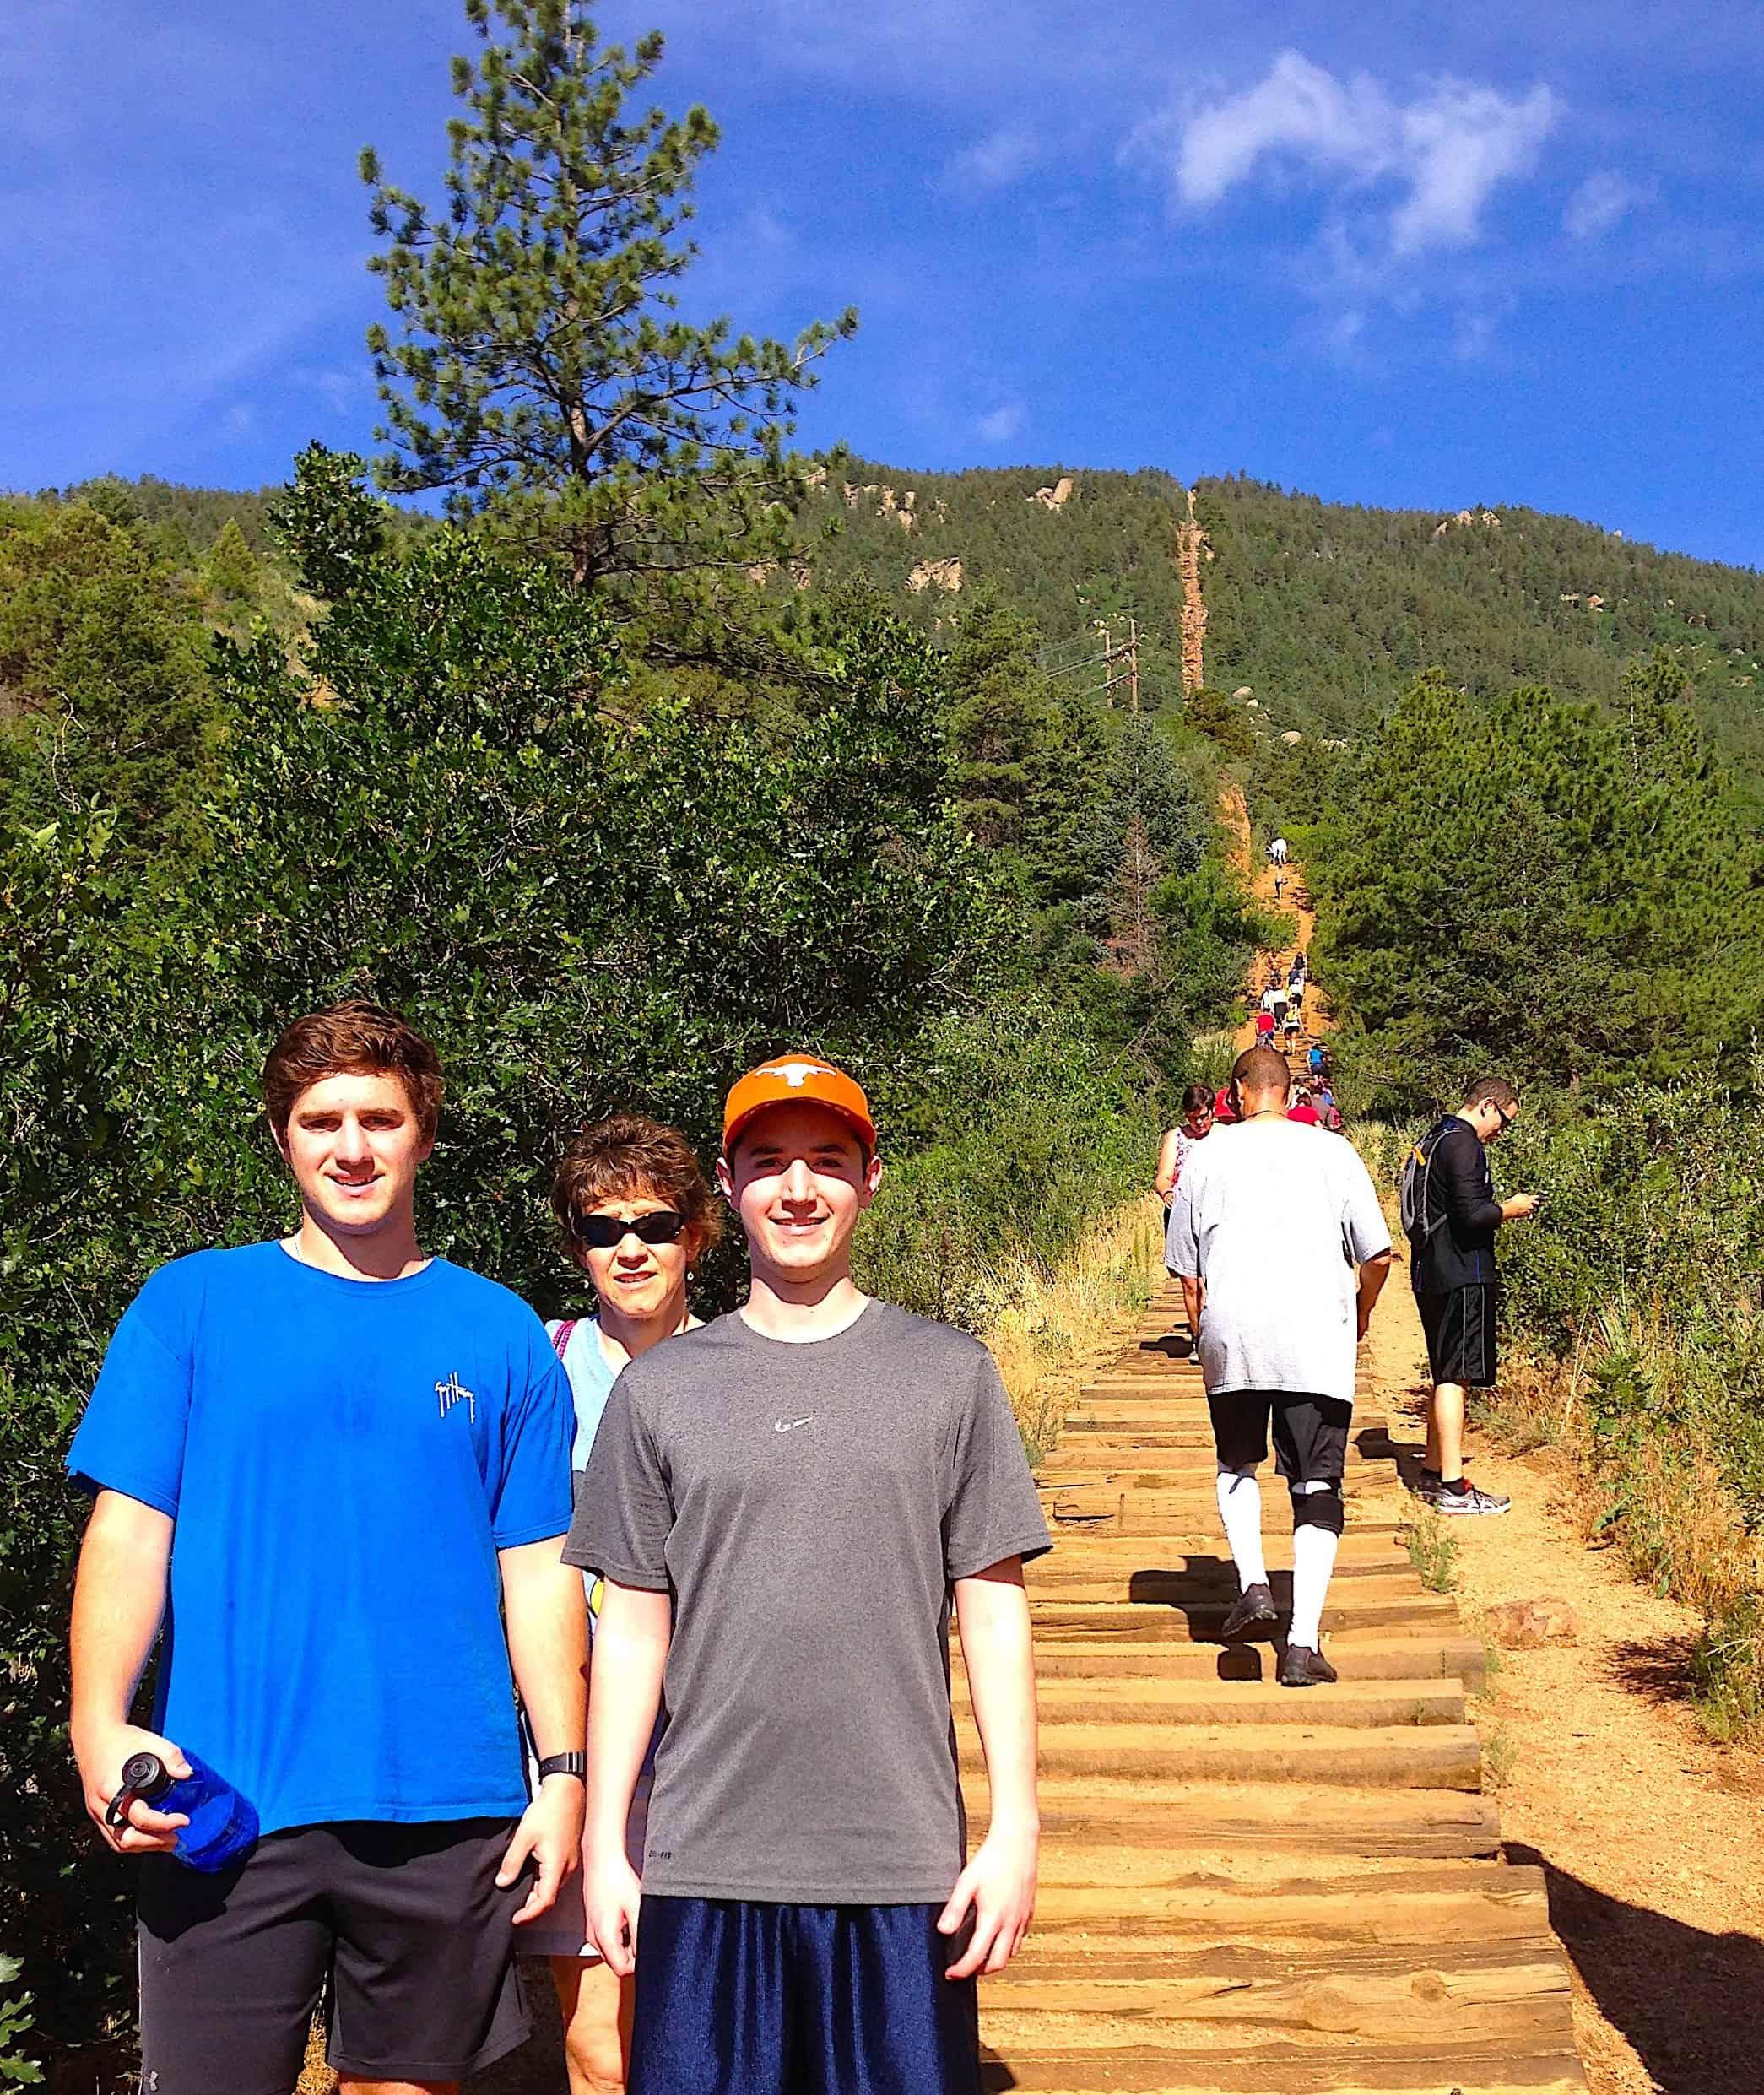 The Incline Colorado Springs